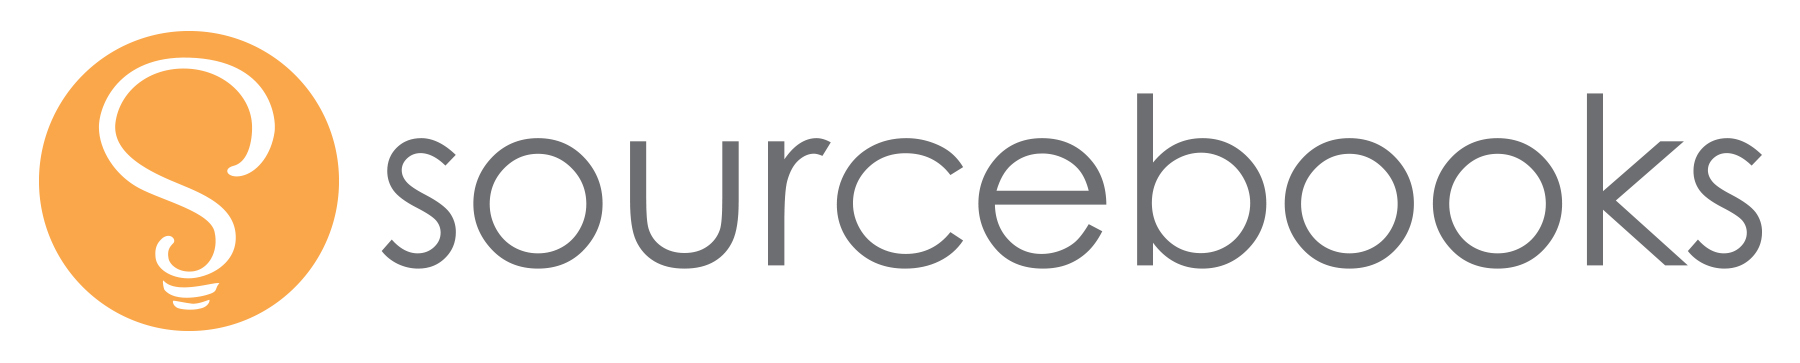 Source Books_Logo_HighRes_Large Logo.jpg